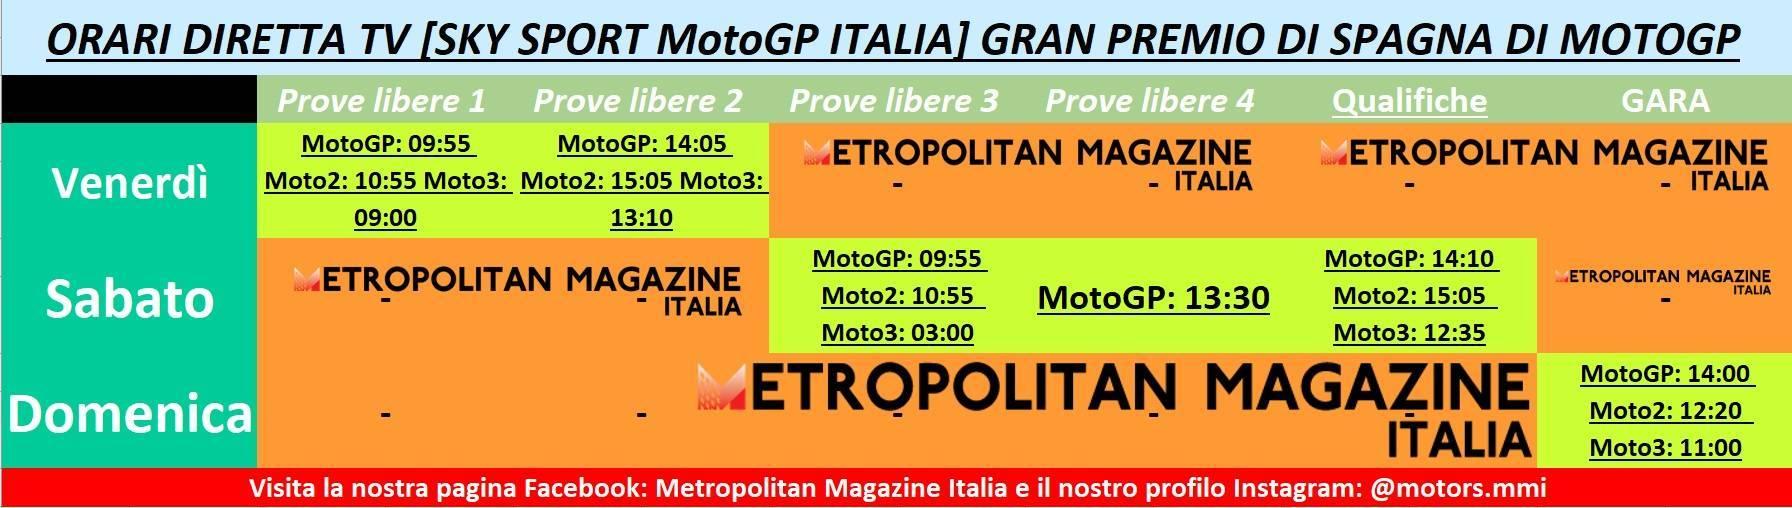 Orari GP Spagna MotoGP 2018 sky sport motogp